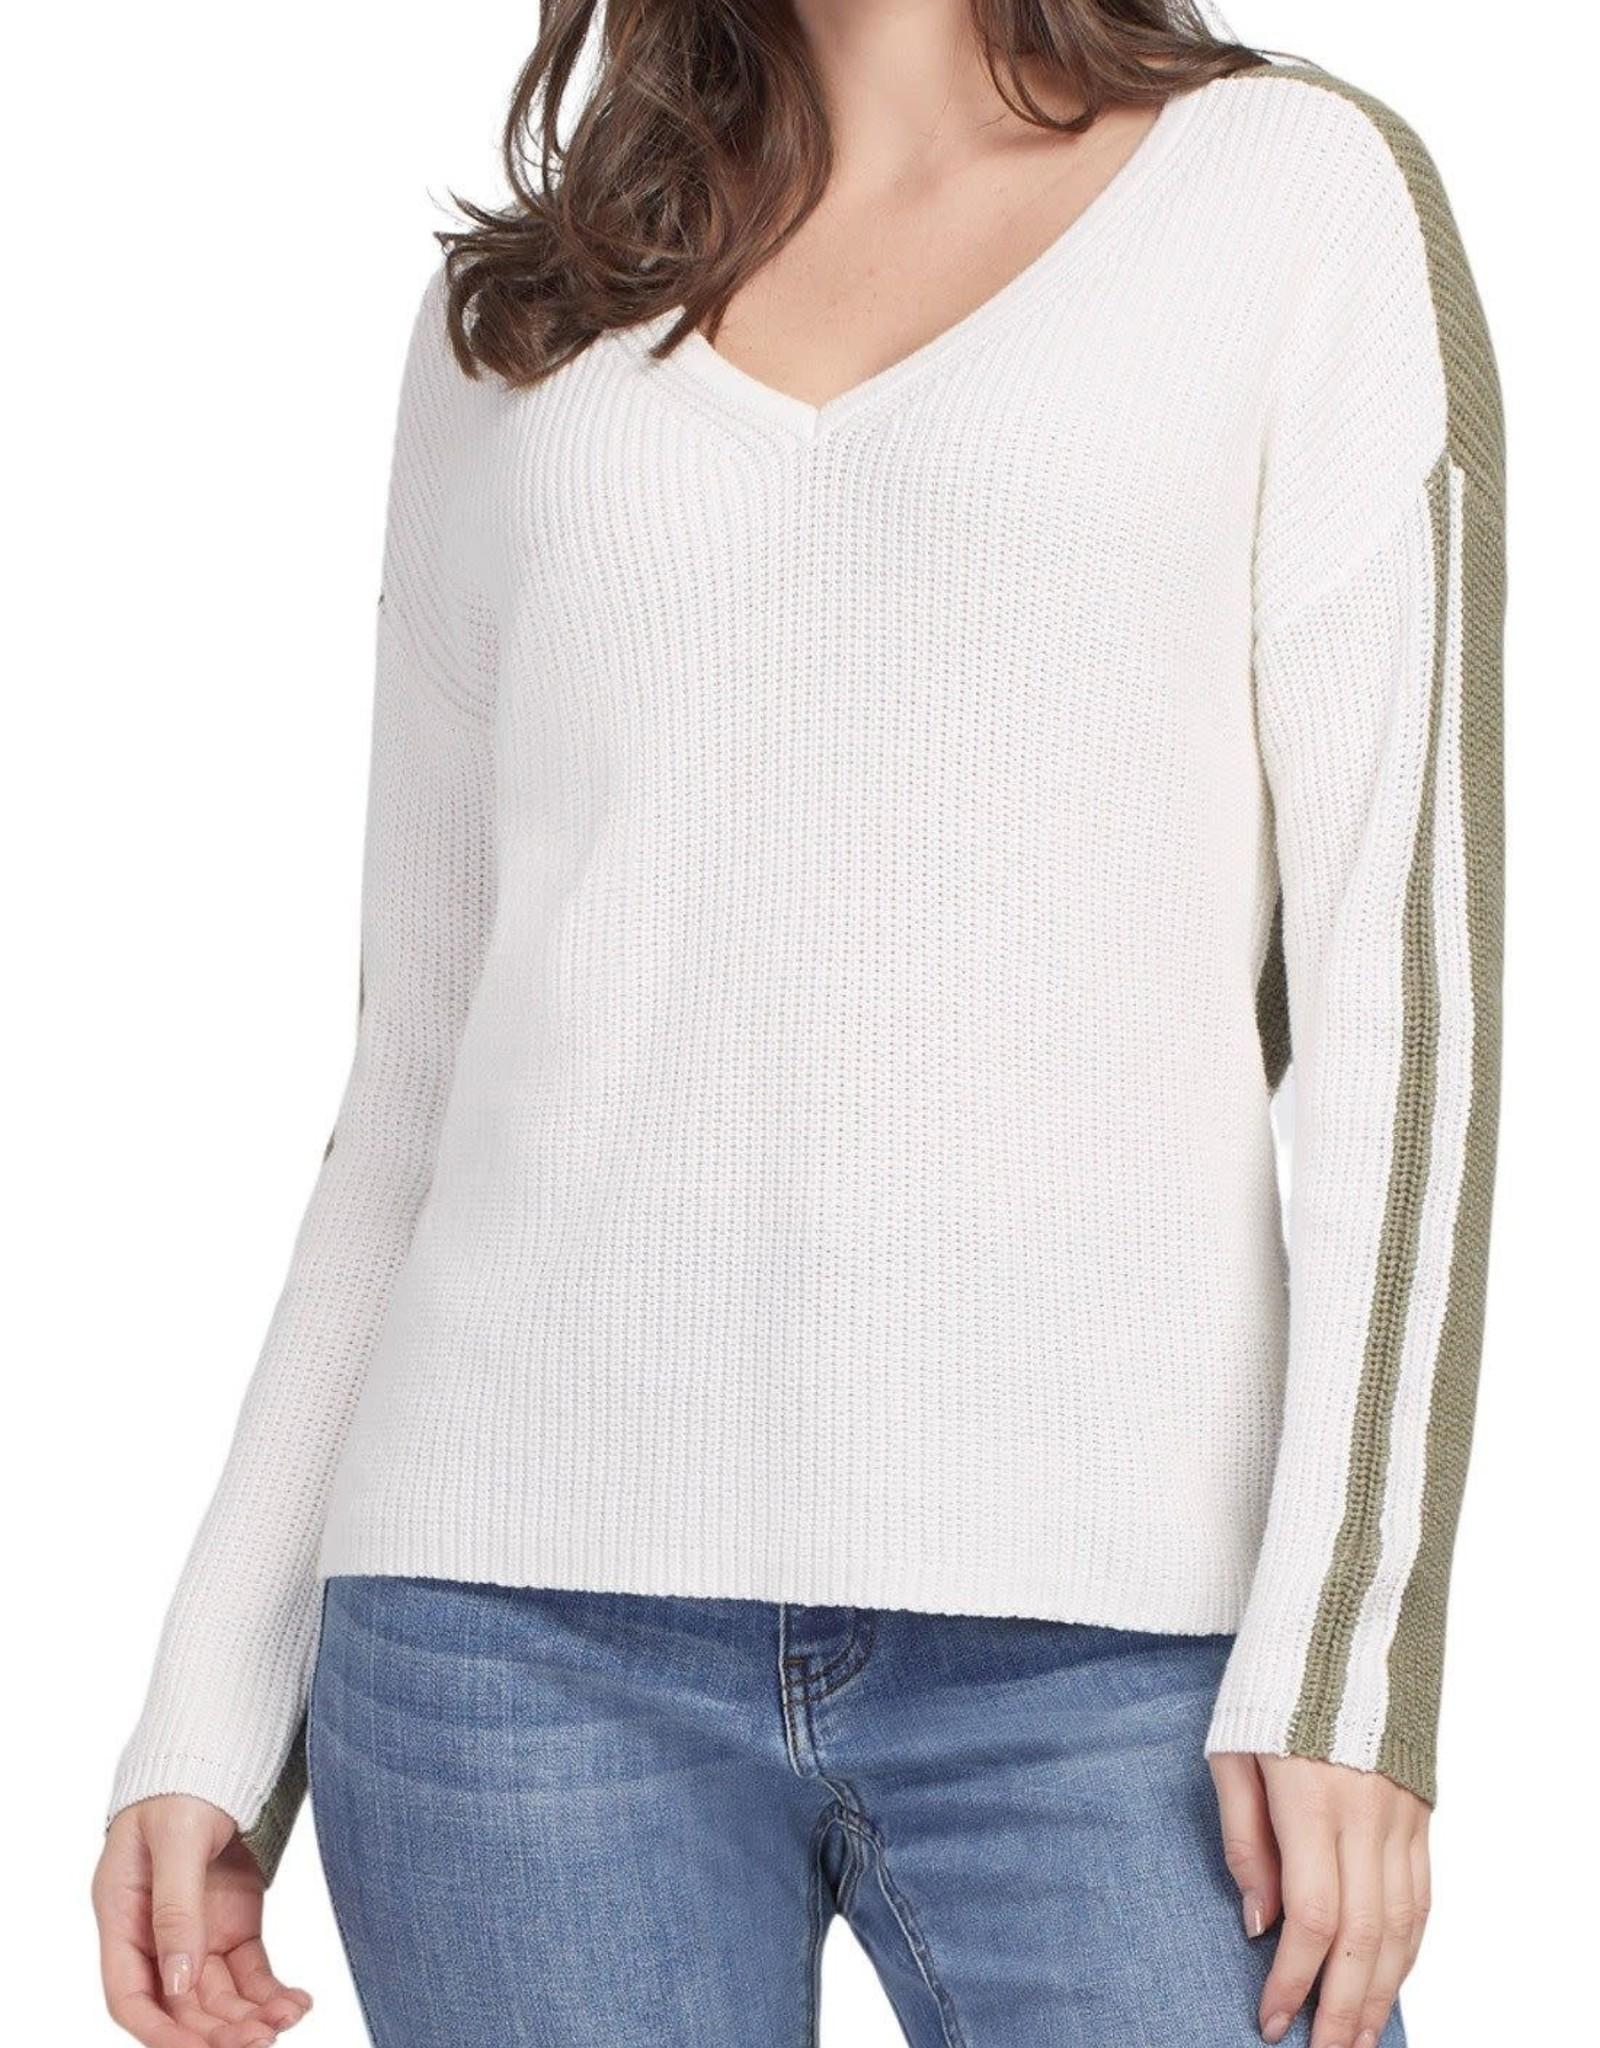 Tribal Ivory/Olive Long Sleeve V-Neck w/ Contrast Back